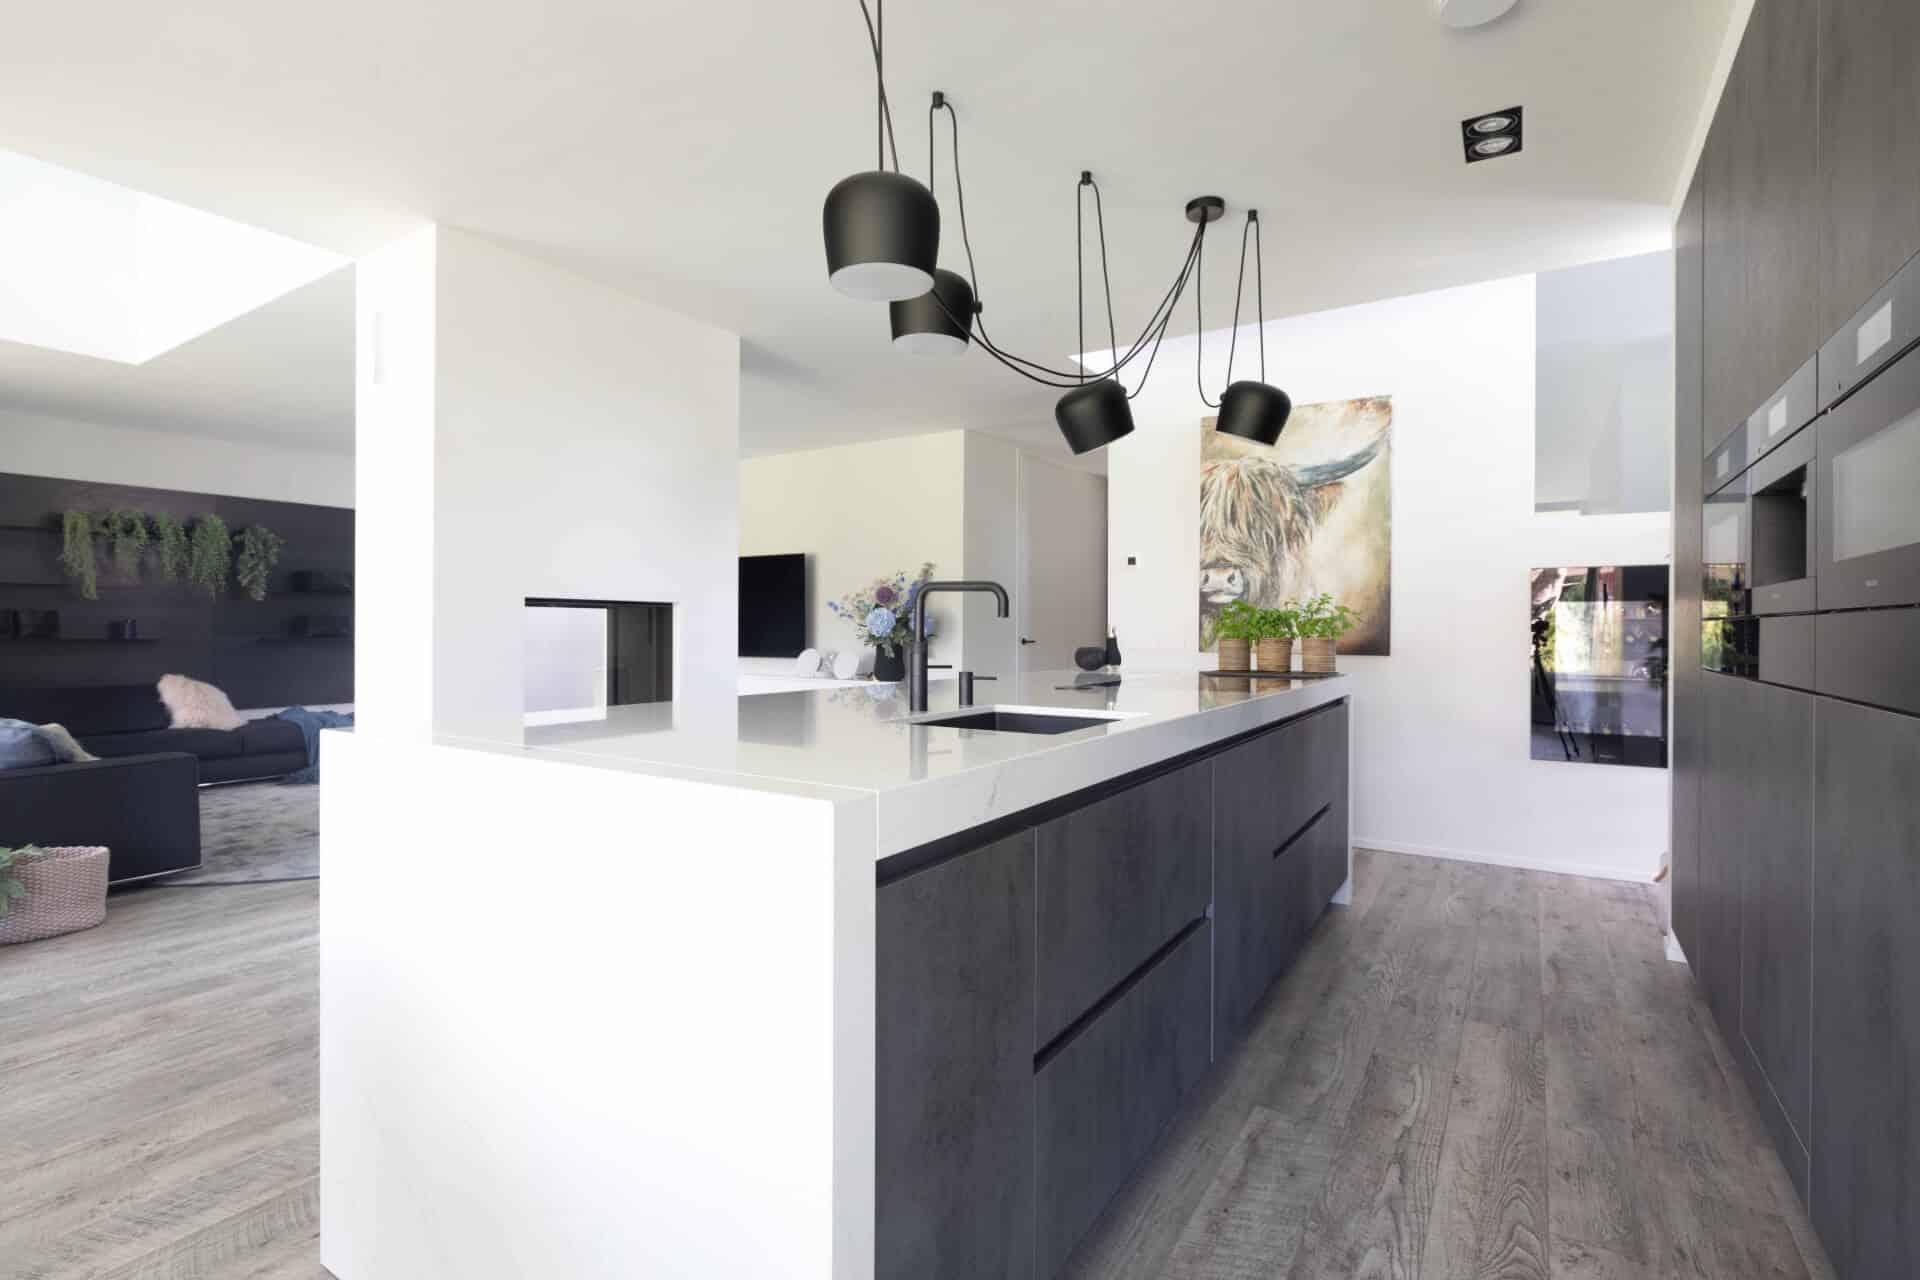 Luxe Design Keuken Lochem Van Ginkel Keukens Barneveld 019